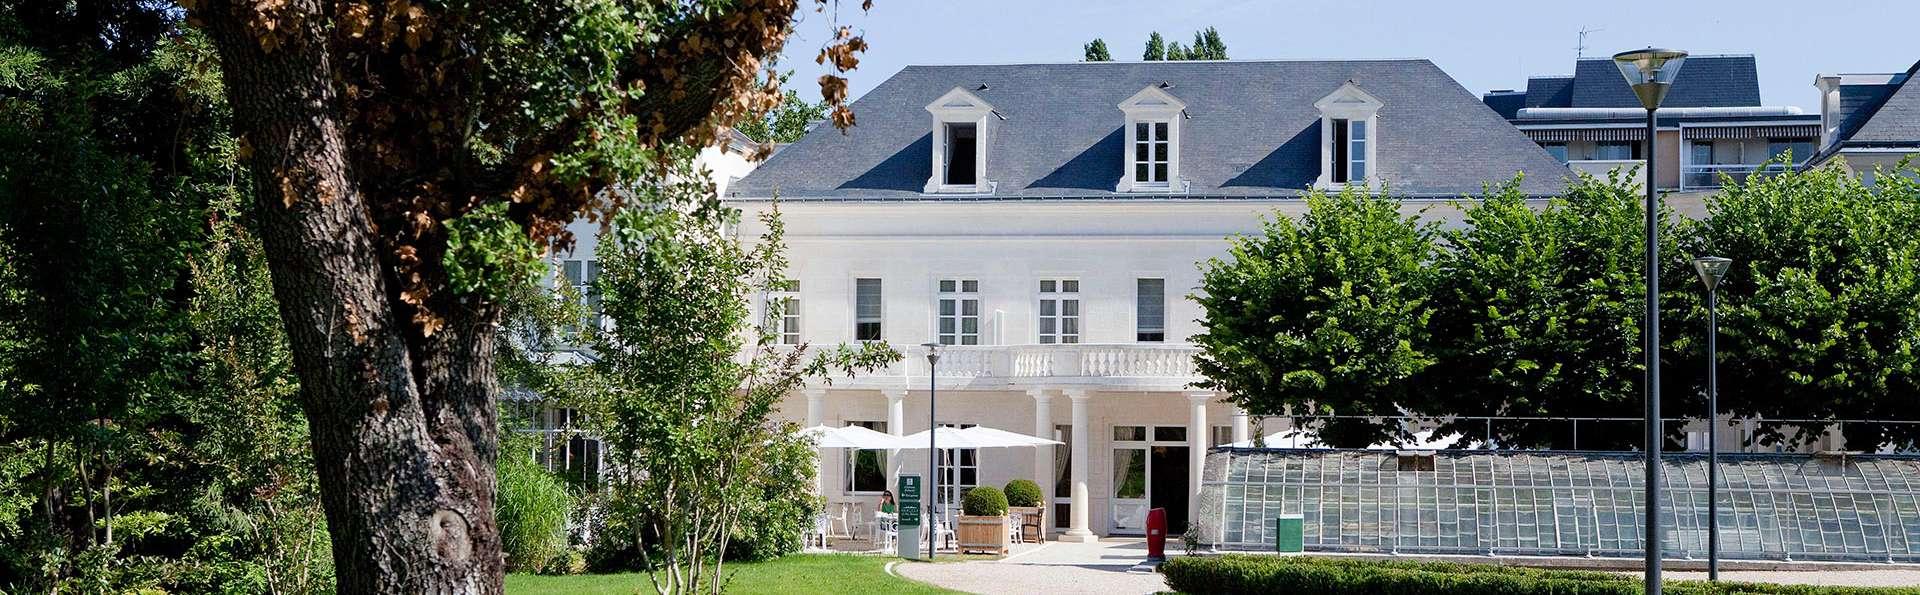 Clarion Hotel Château Belmont - edit_front8.jpg